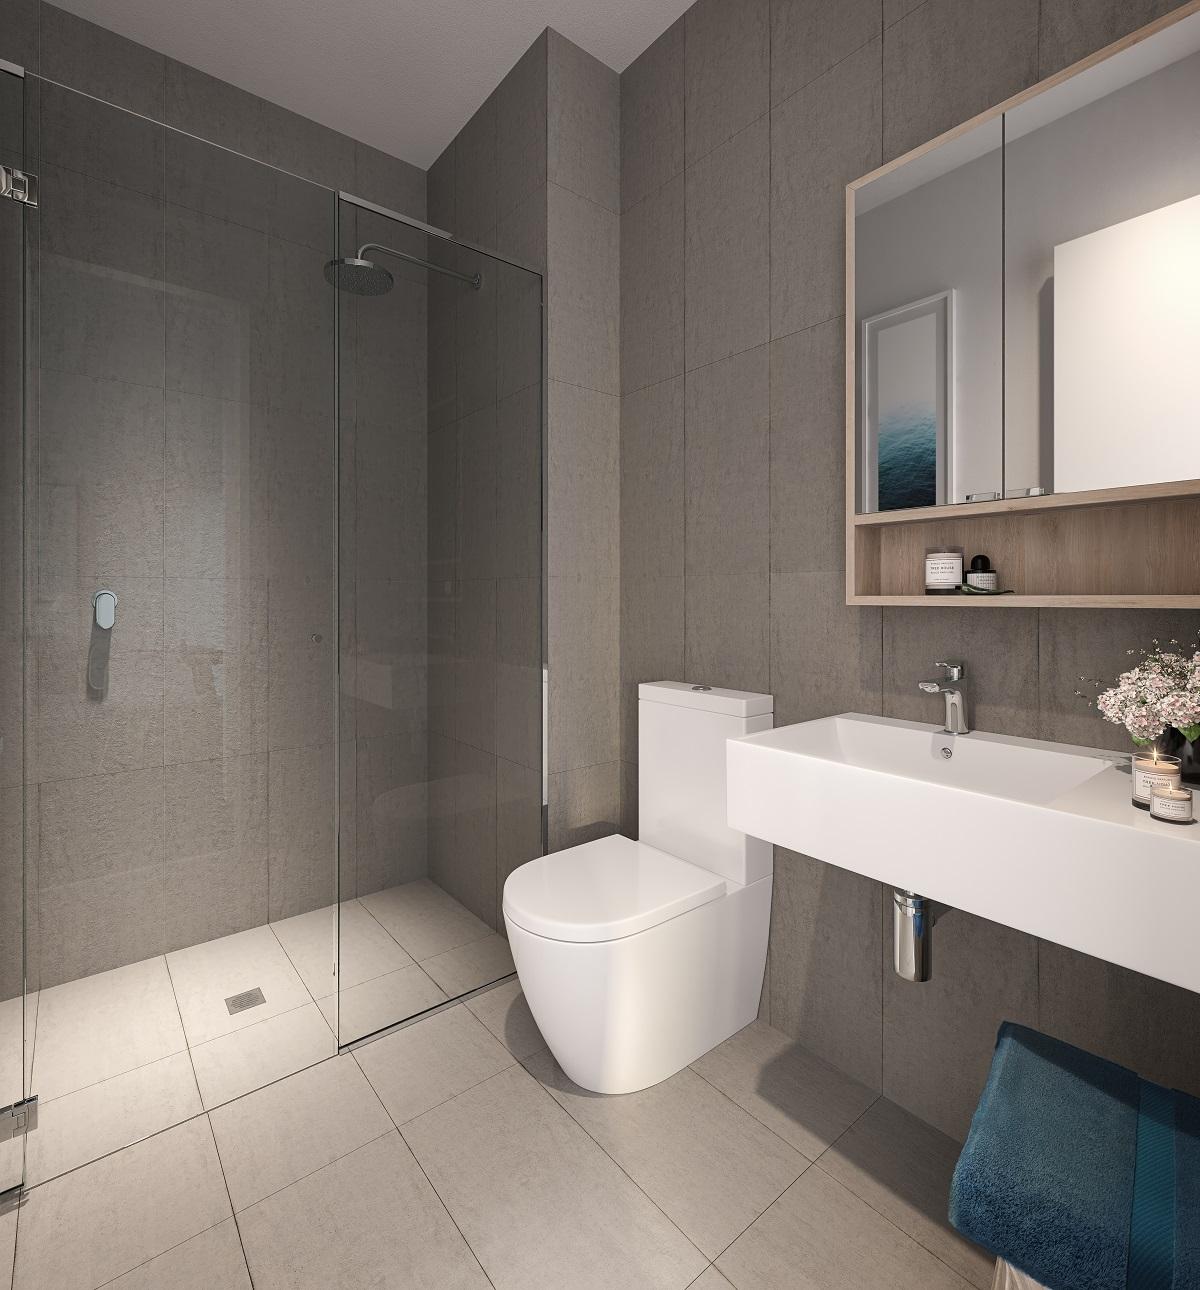 SPG1453_HancockSt_S150_INT_Bathroom_Fina